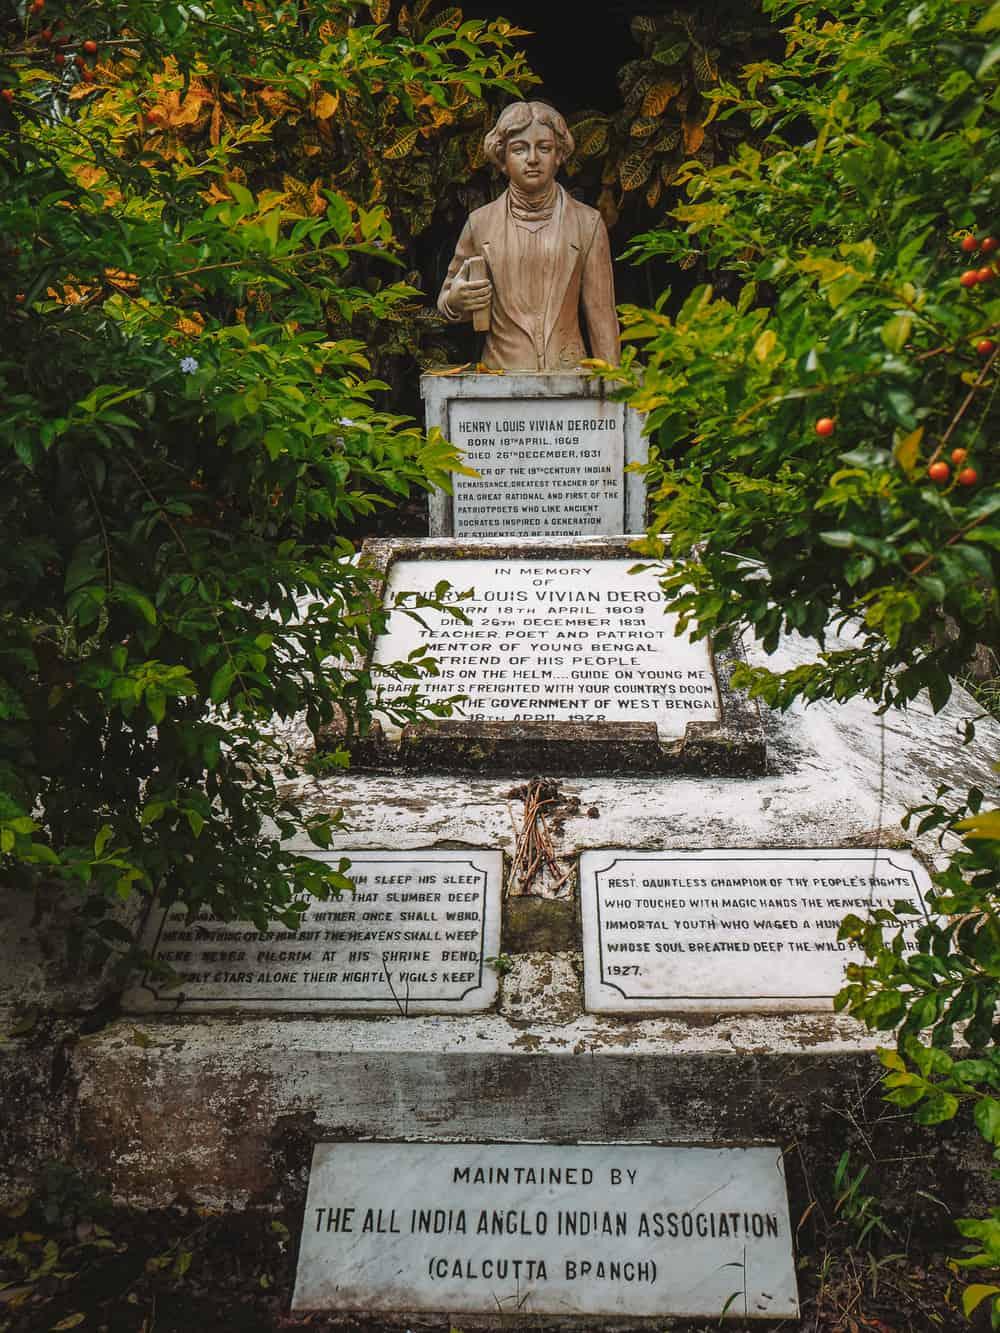 Henry Derozio's Tomb